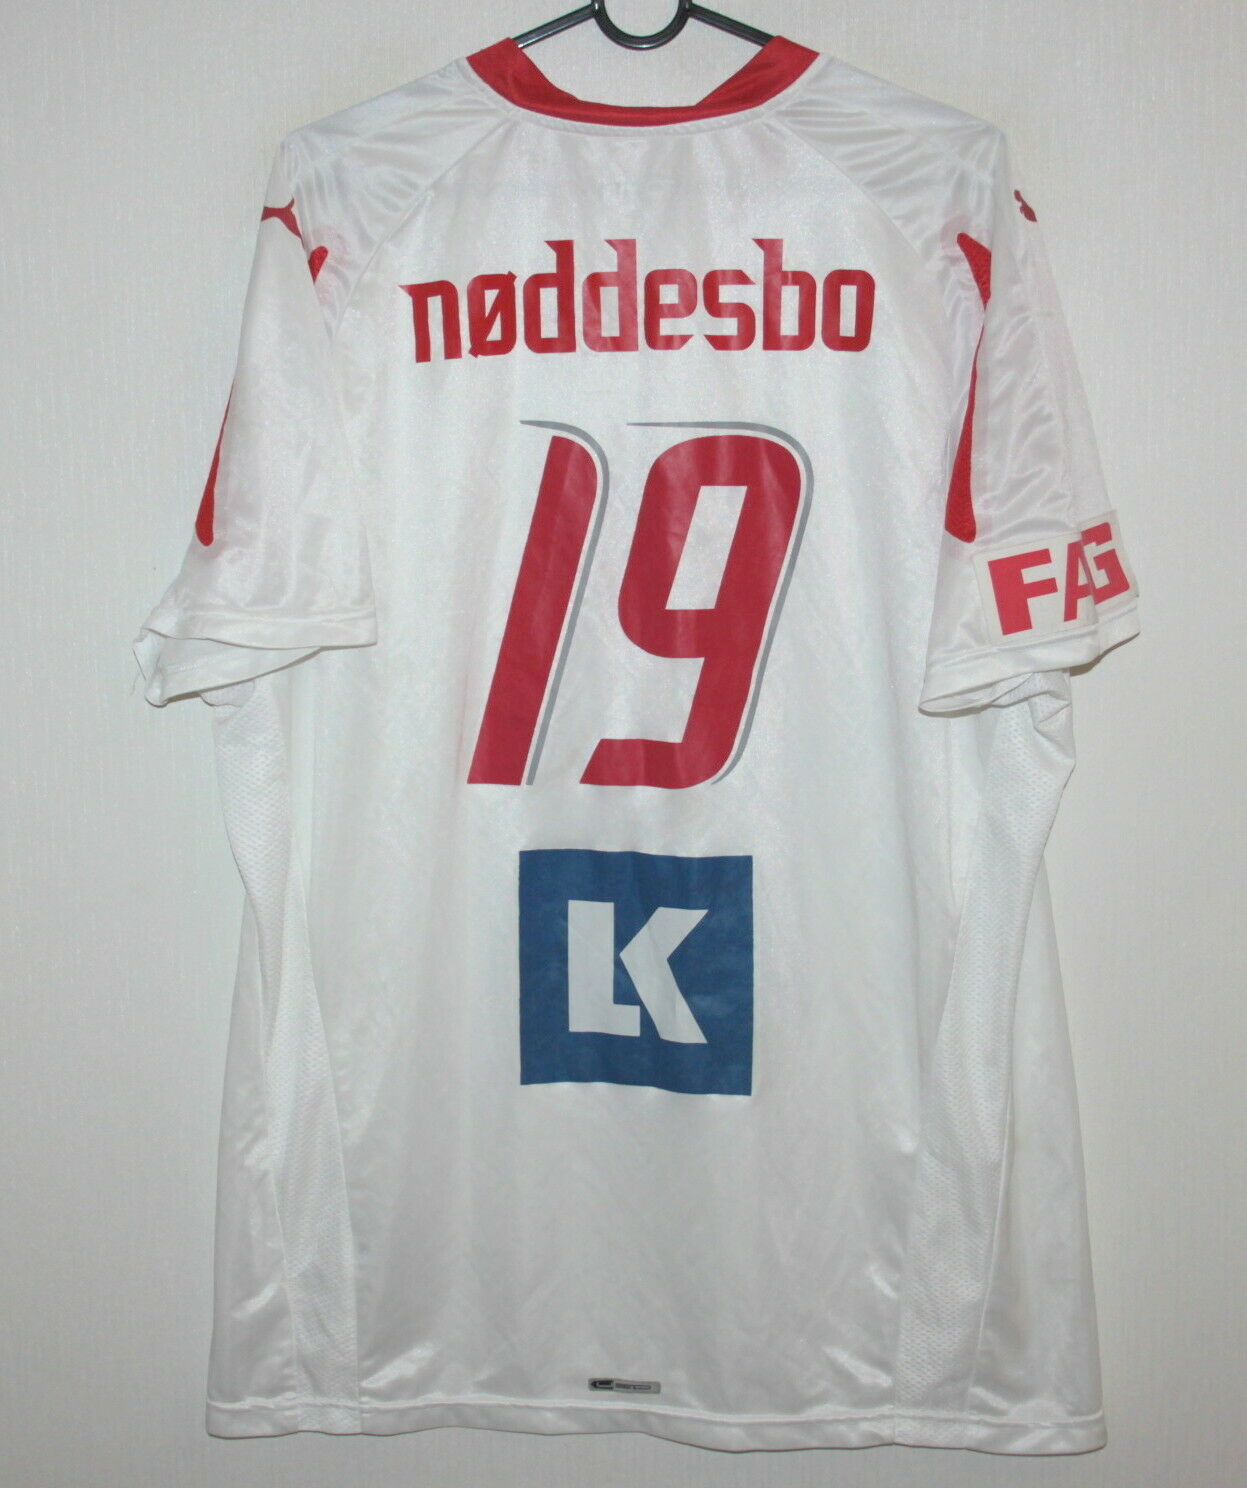 Dinamarca Balonmano Equipo Match Worn firmado Camisa Jasper Noddesbo Puma Tamaño Xl